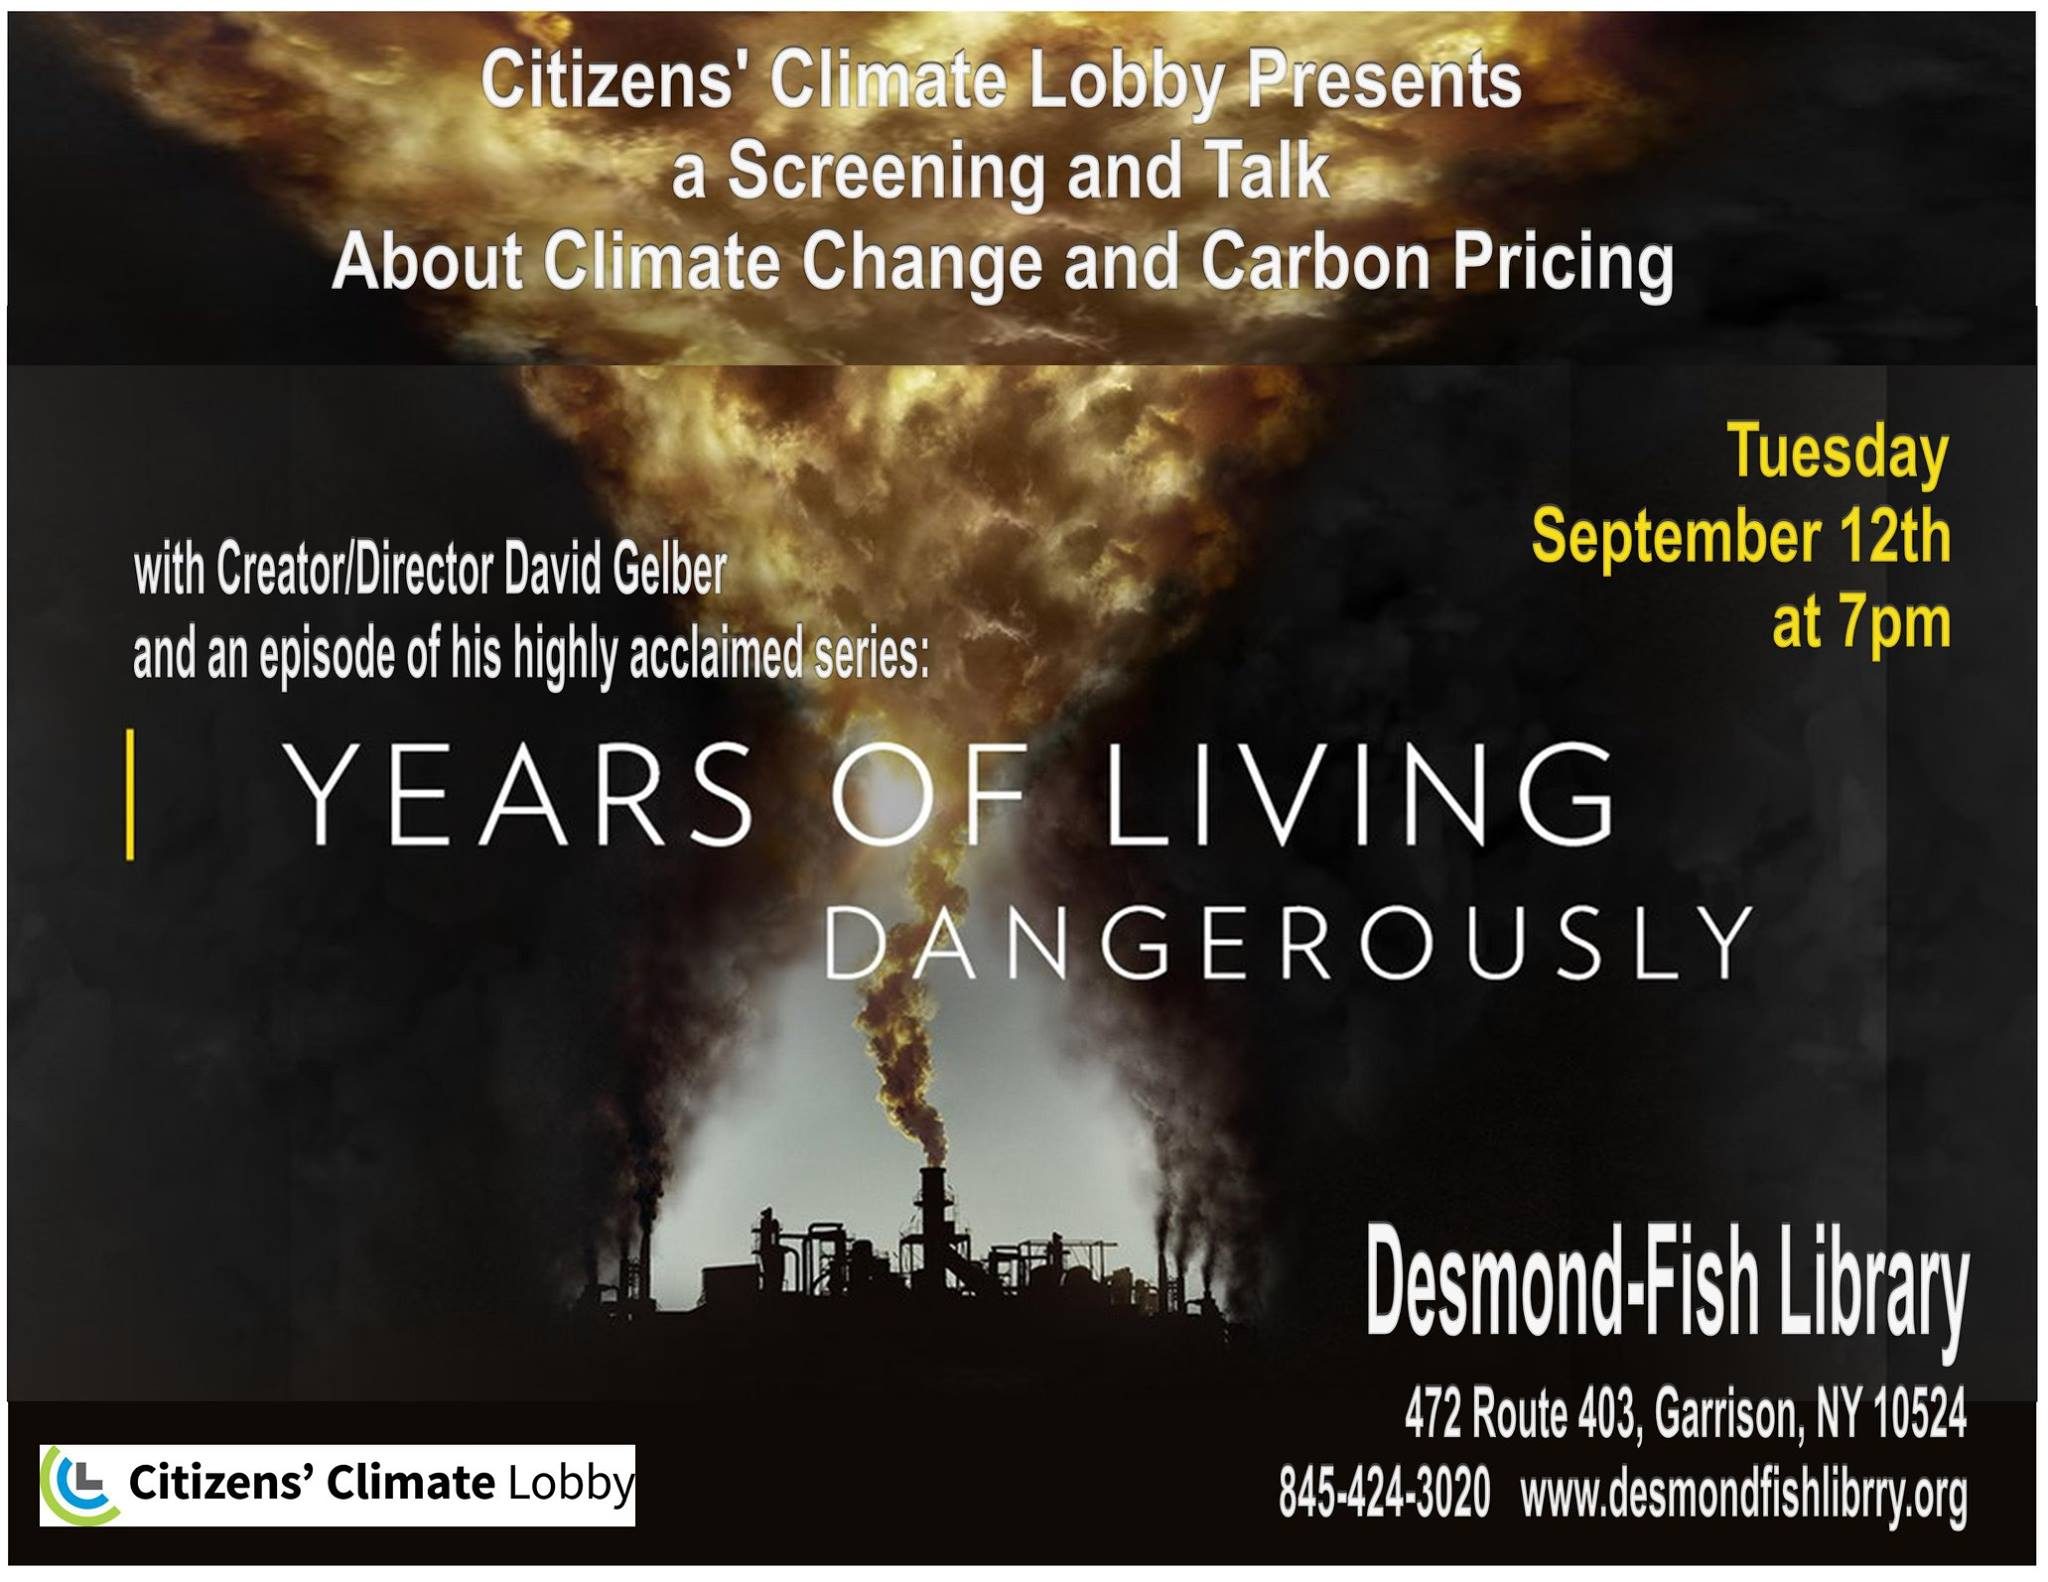 2017-09-12_yearsOfLivingDangerouslyAtFishLib.jpg